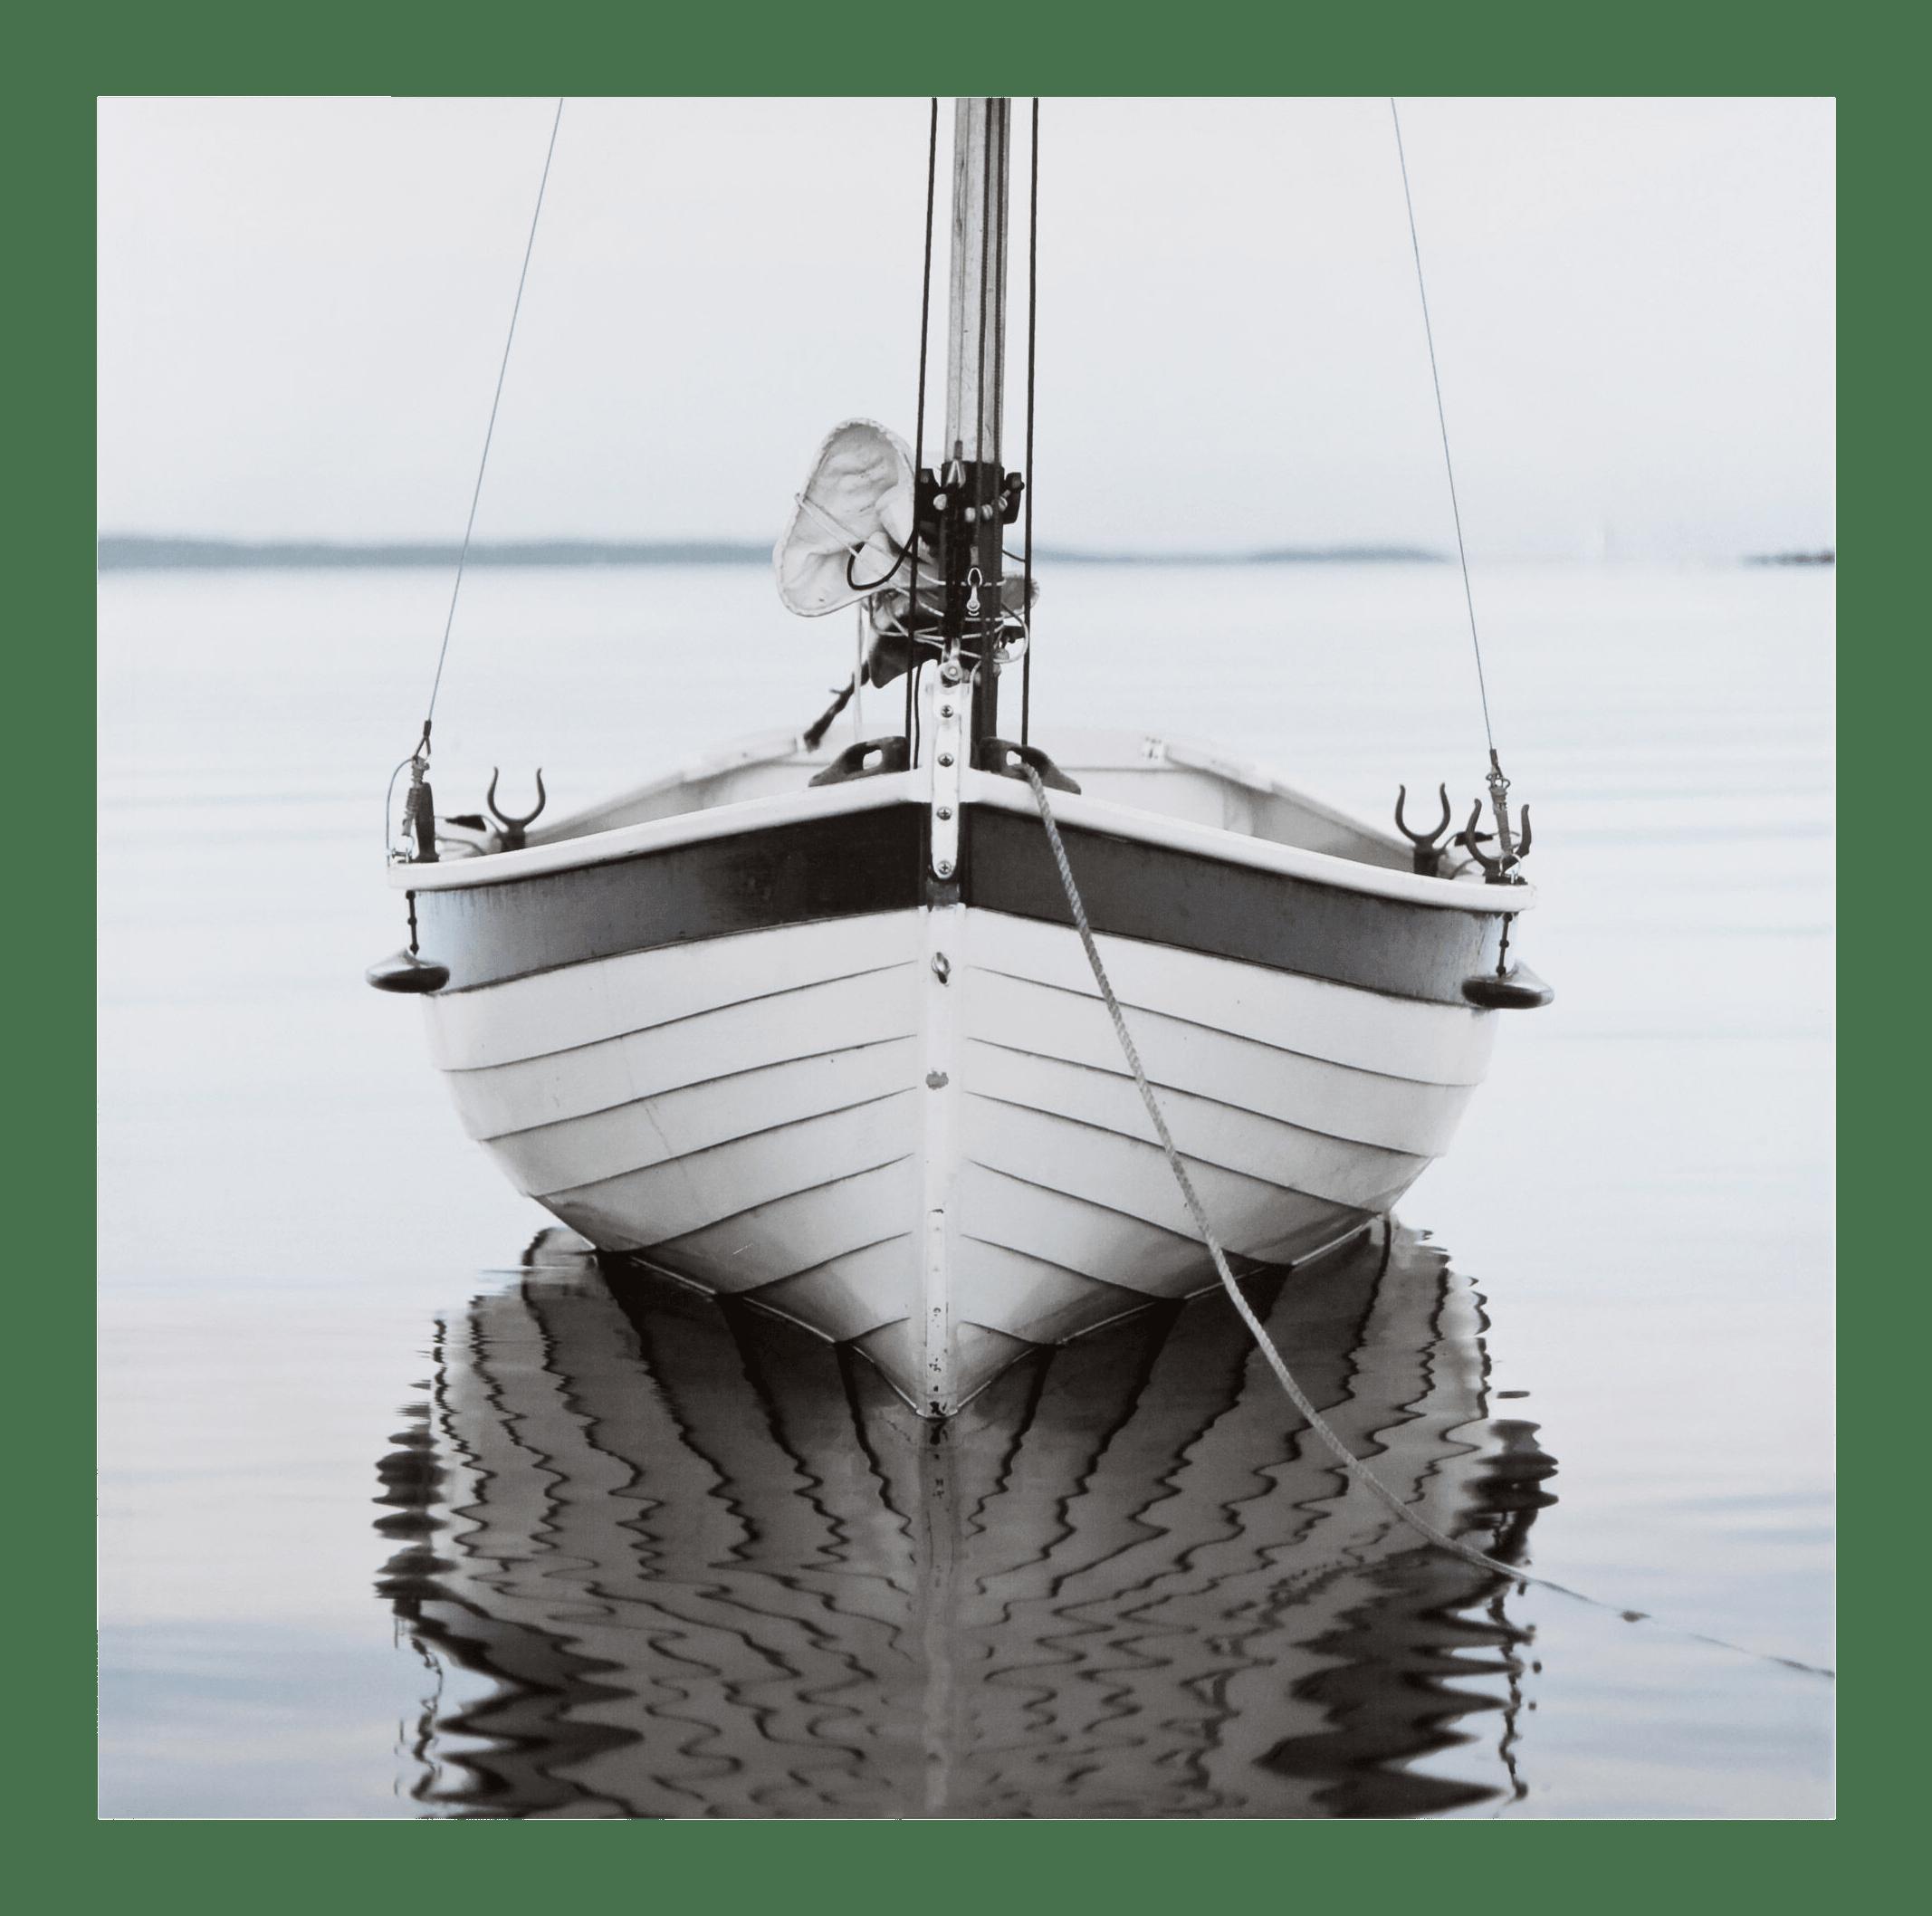 Boat Close-Up Printed Canvas